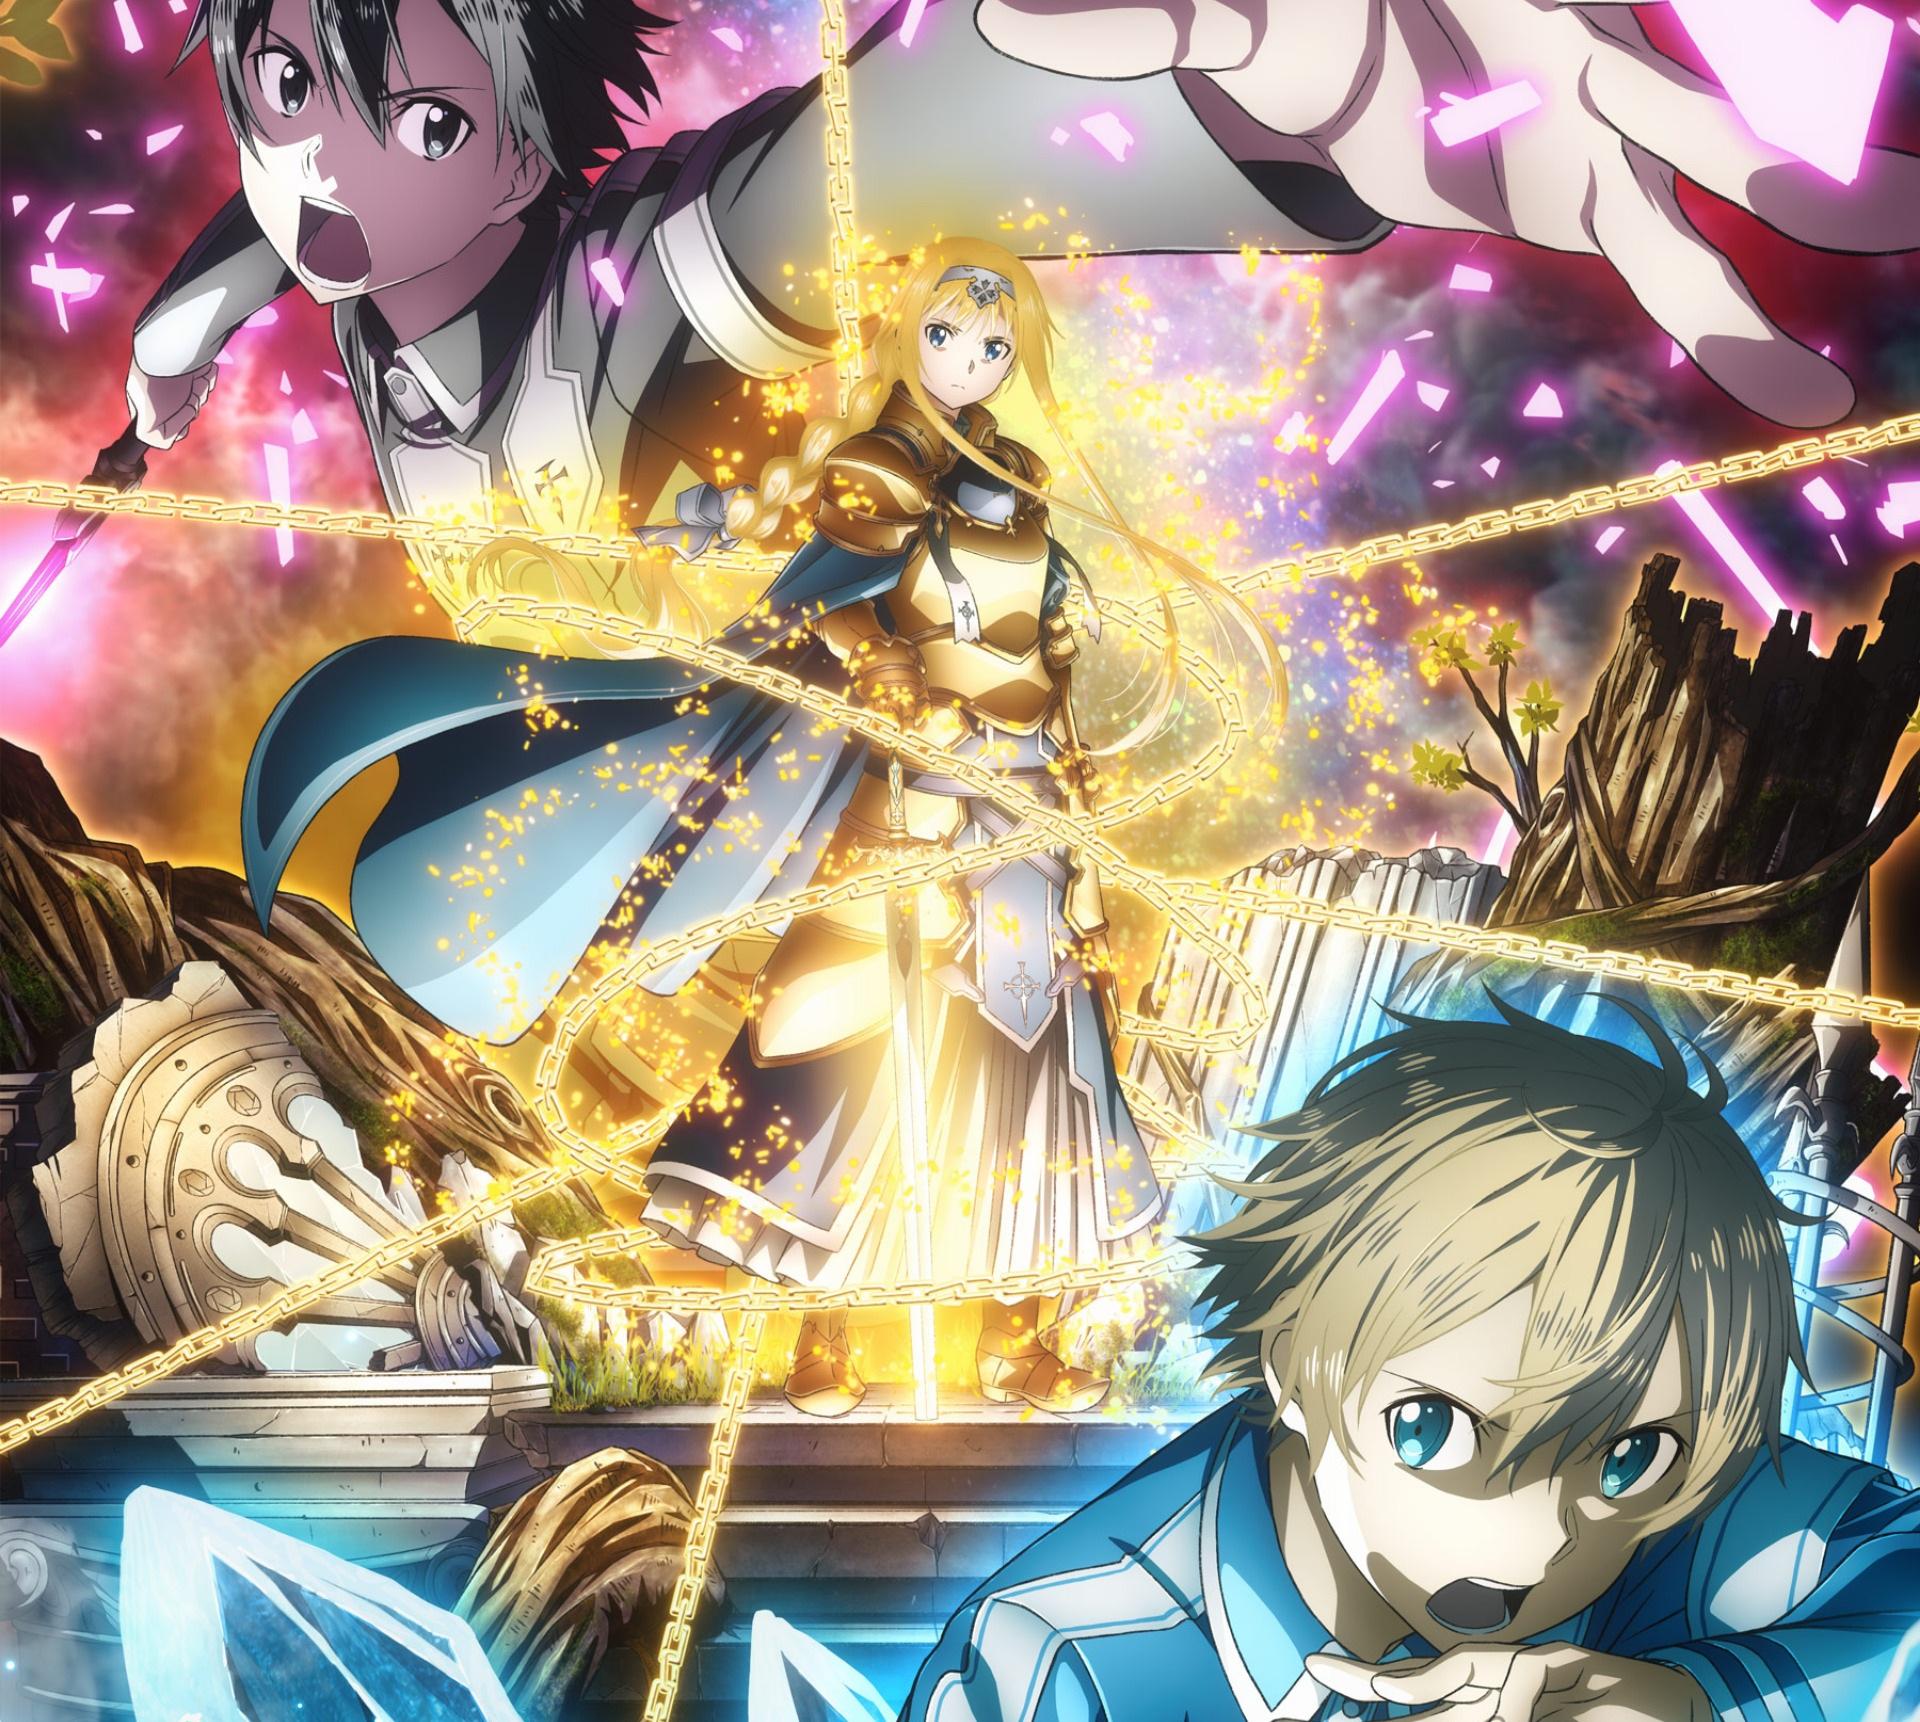 Online Wallpaper: Sword Art Online: Alicization HD Wallpaper